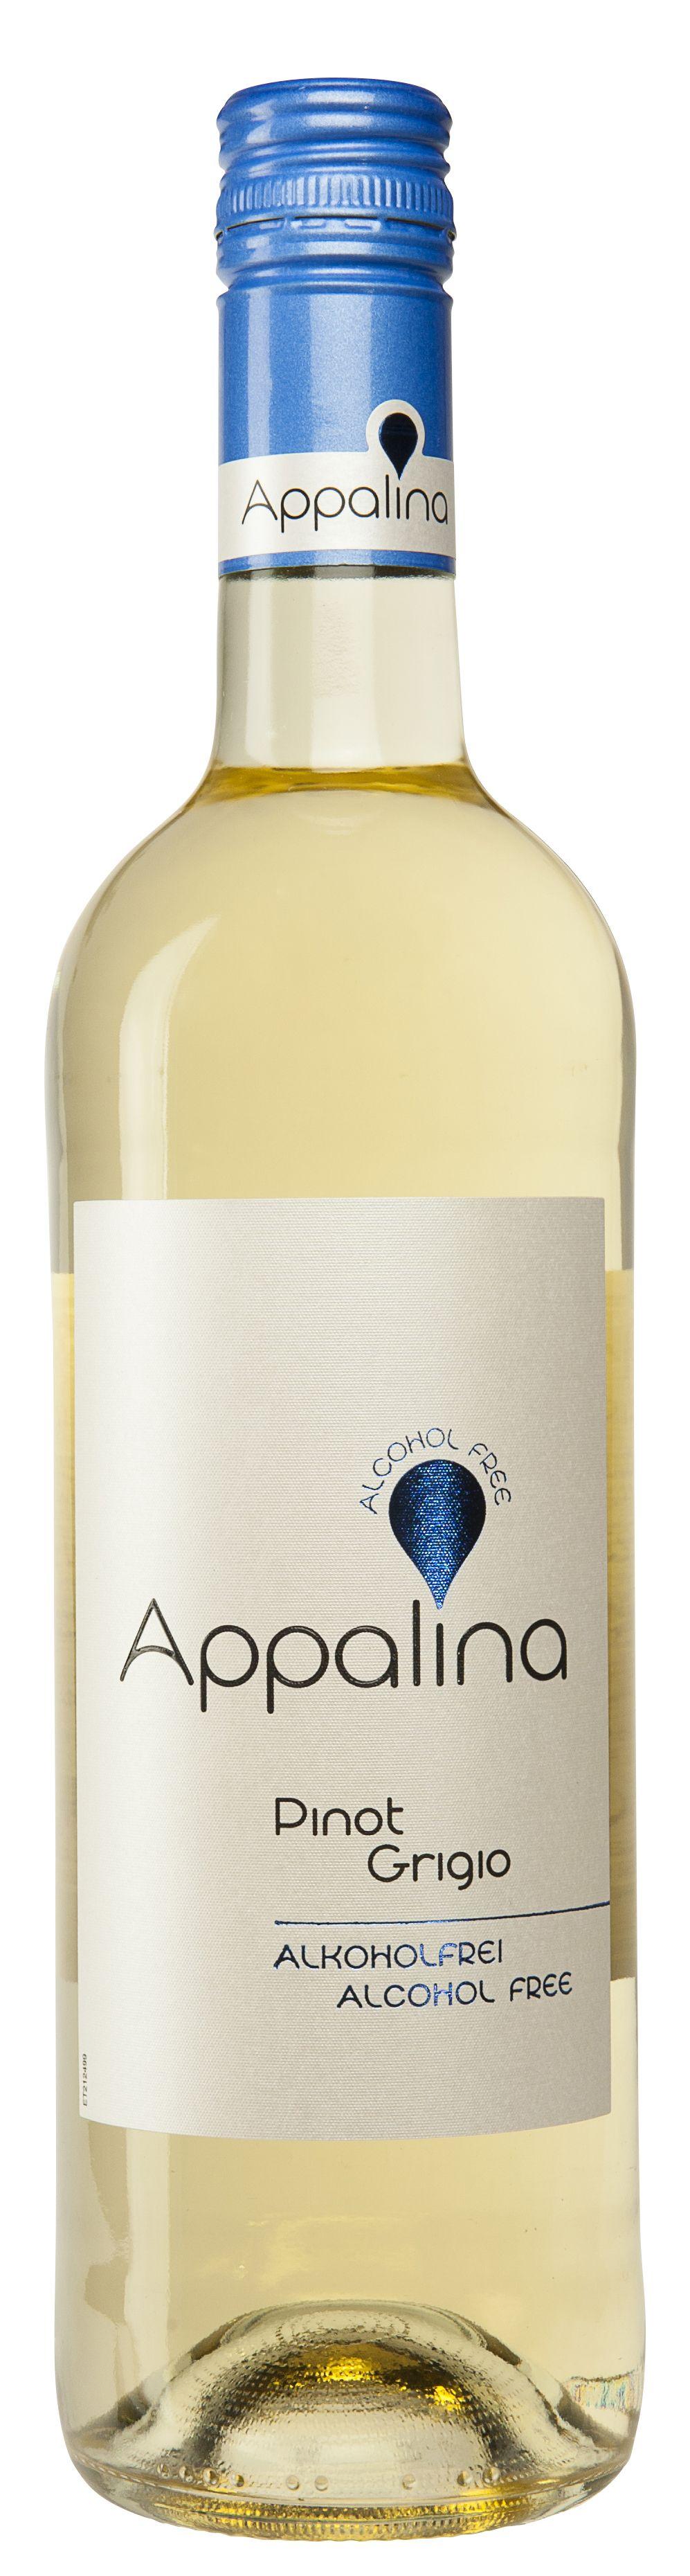 Appalina Pinot Grigio, Non Alcohol